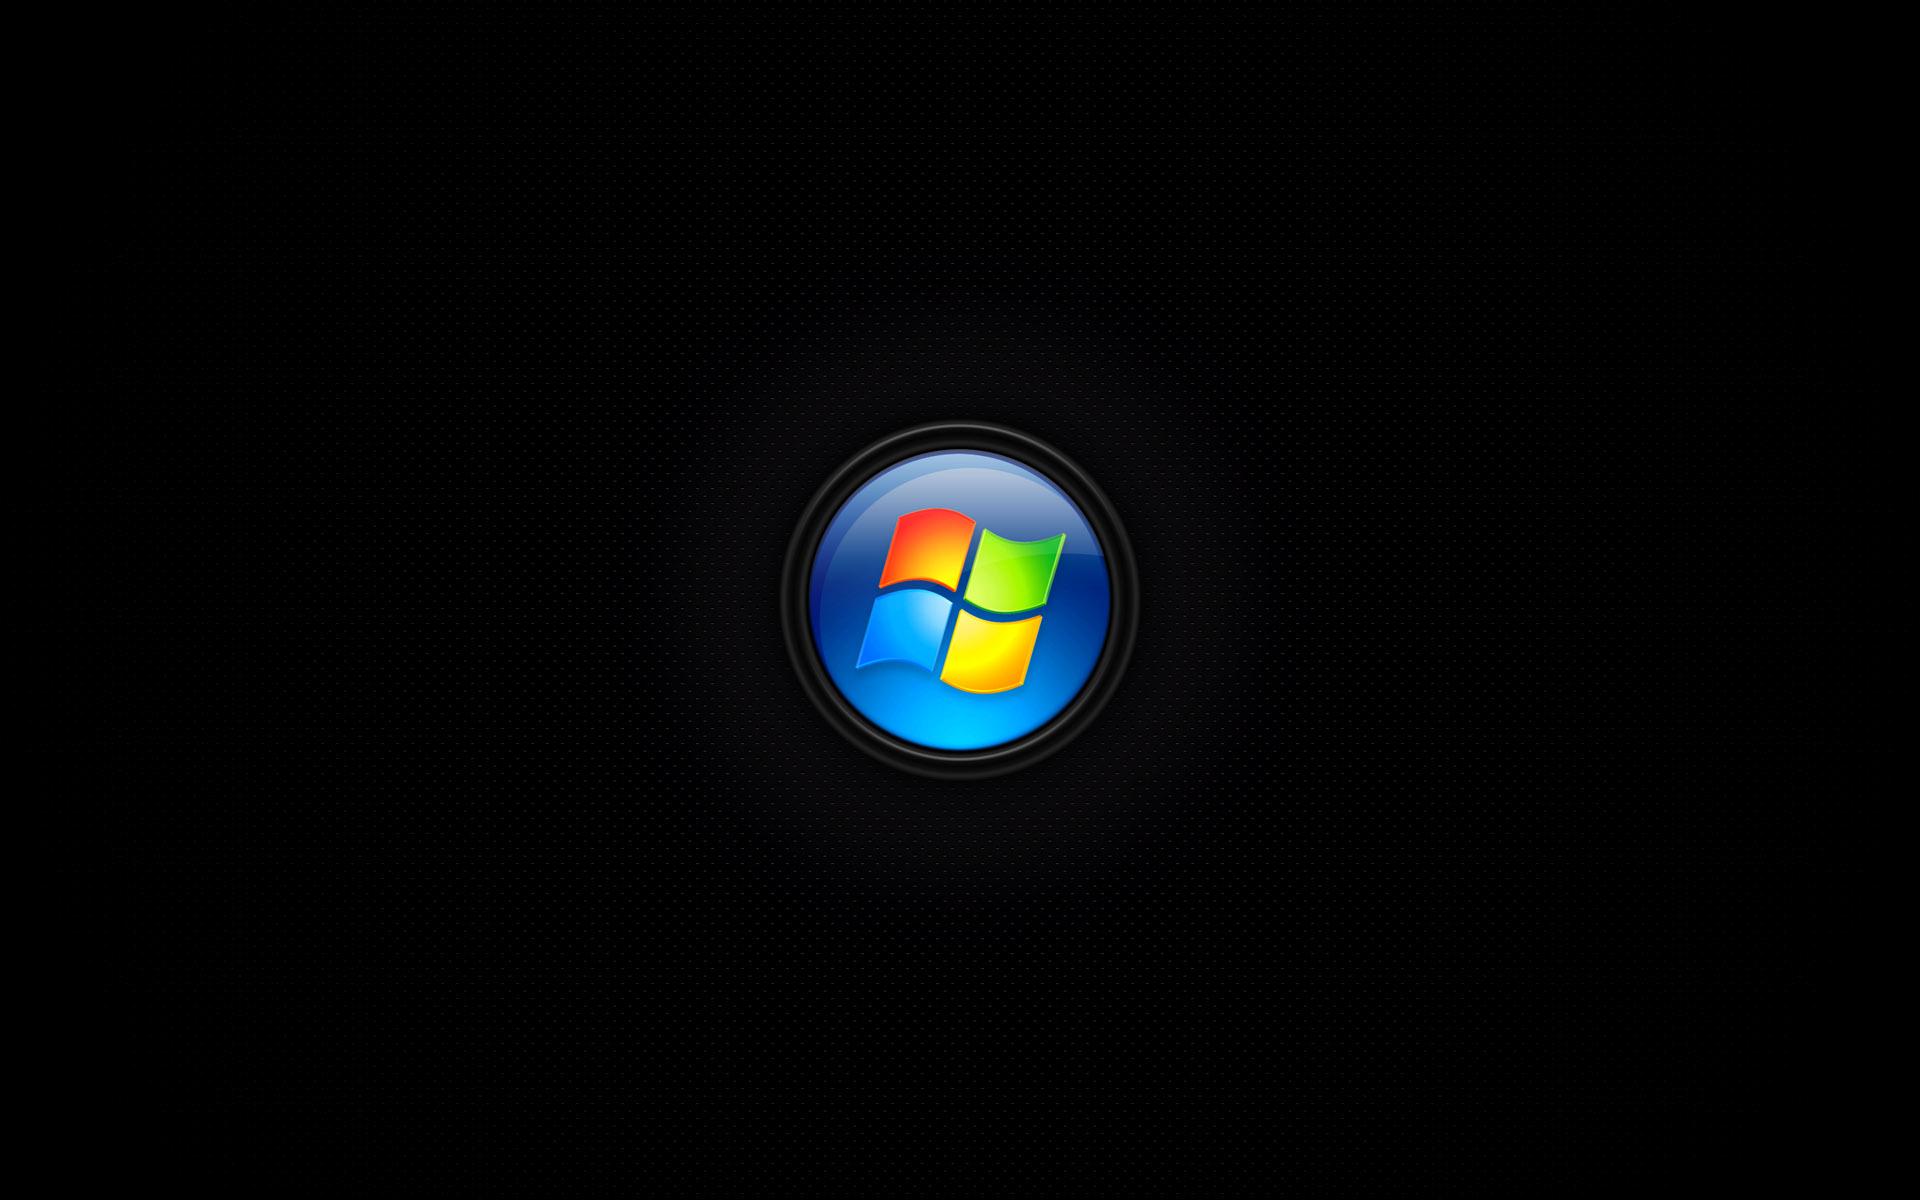 windows 10 desktop is black 16 cool wallpaper